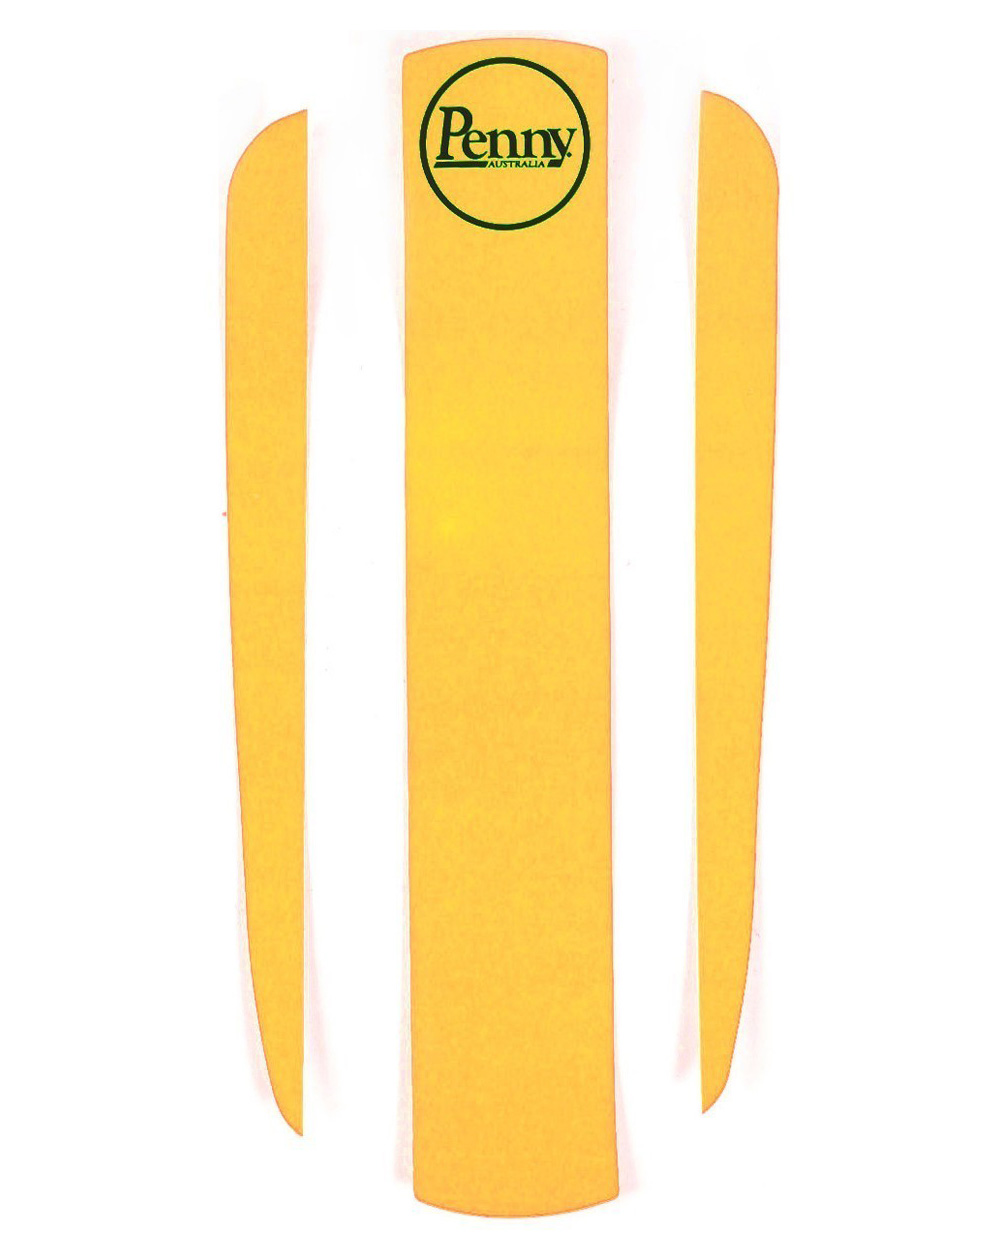 Penny Pannelli Adesivi Orange 22-inch